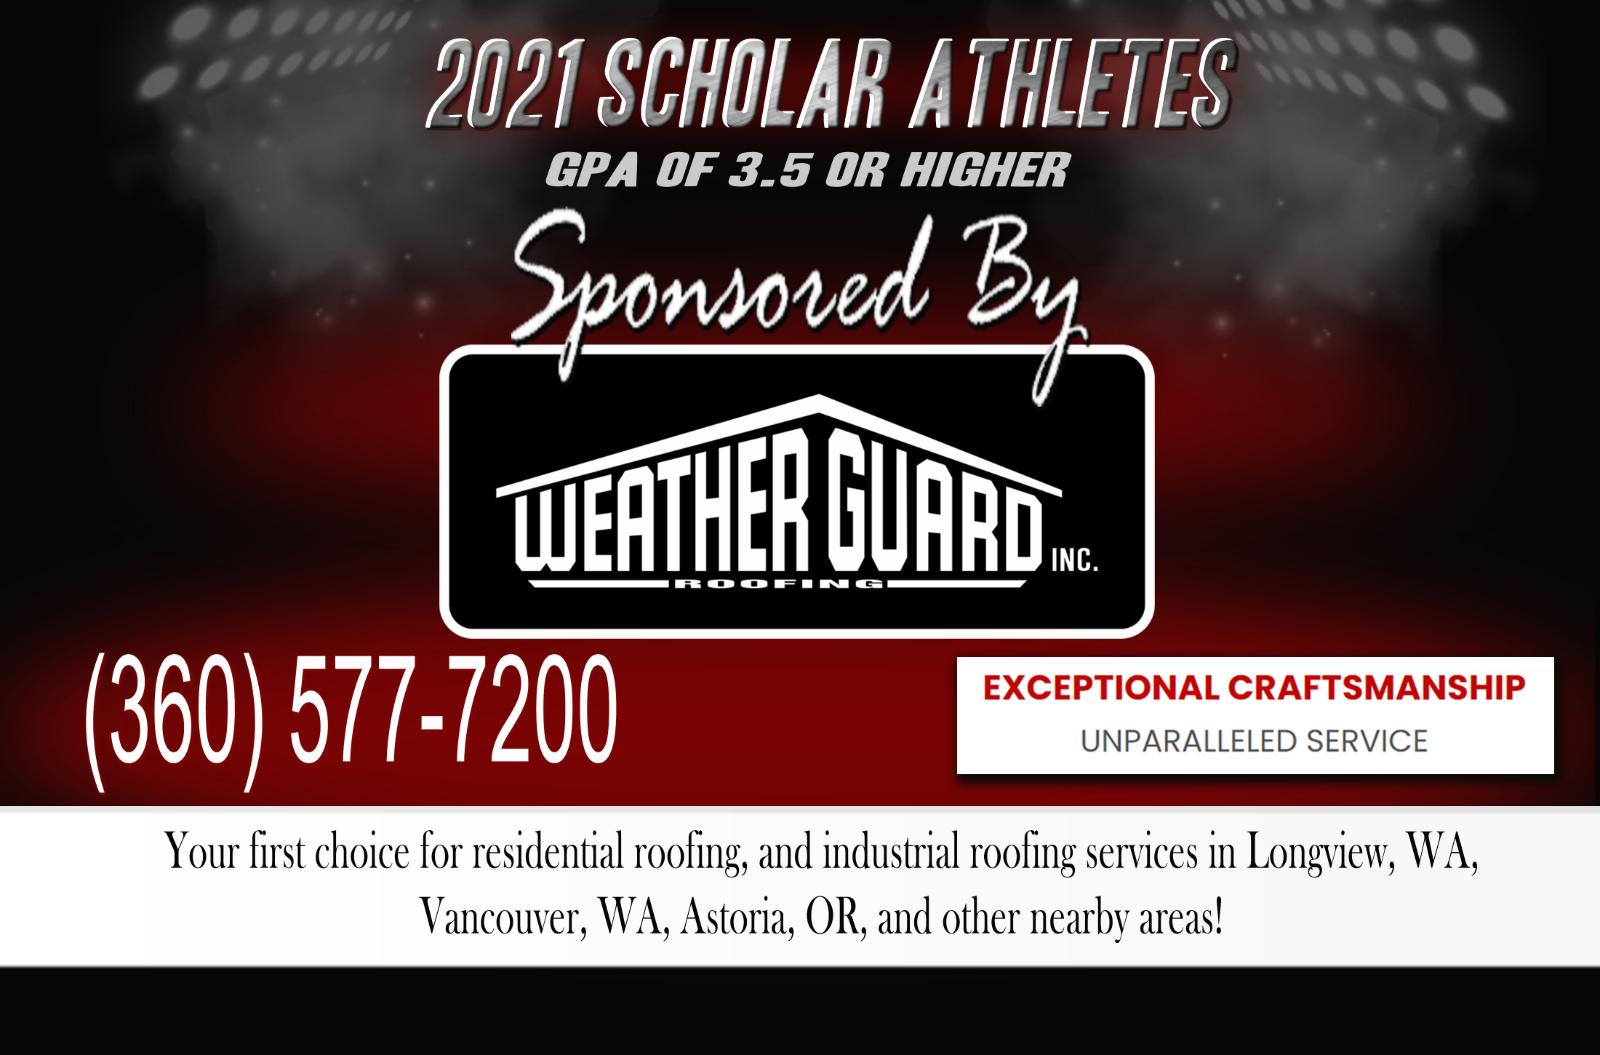 Season 1 Scholar Athletes – Sponsored by Weatherguard